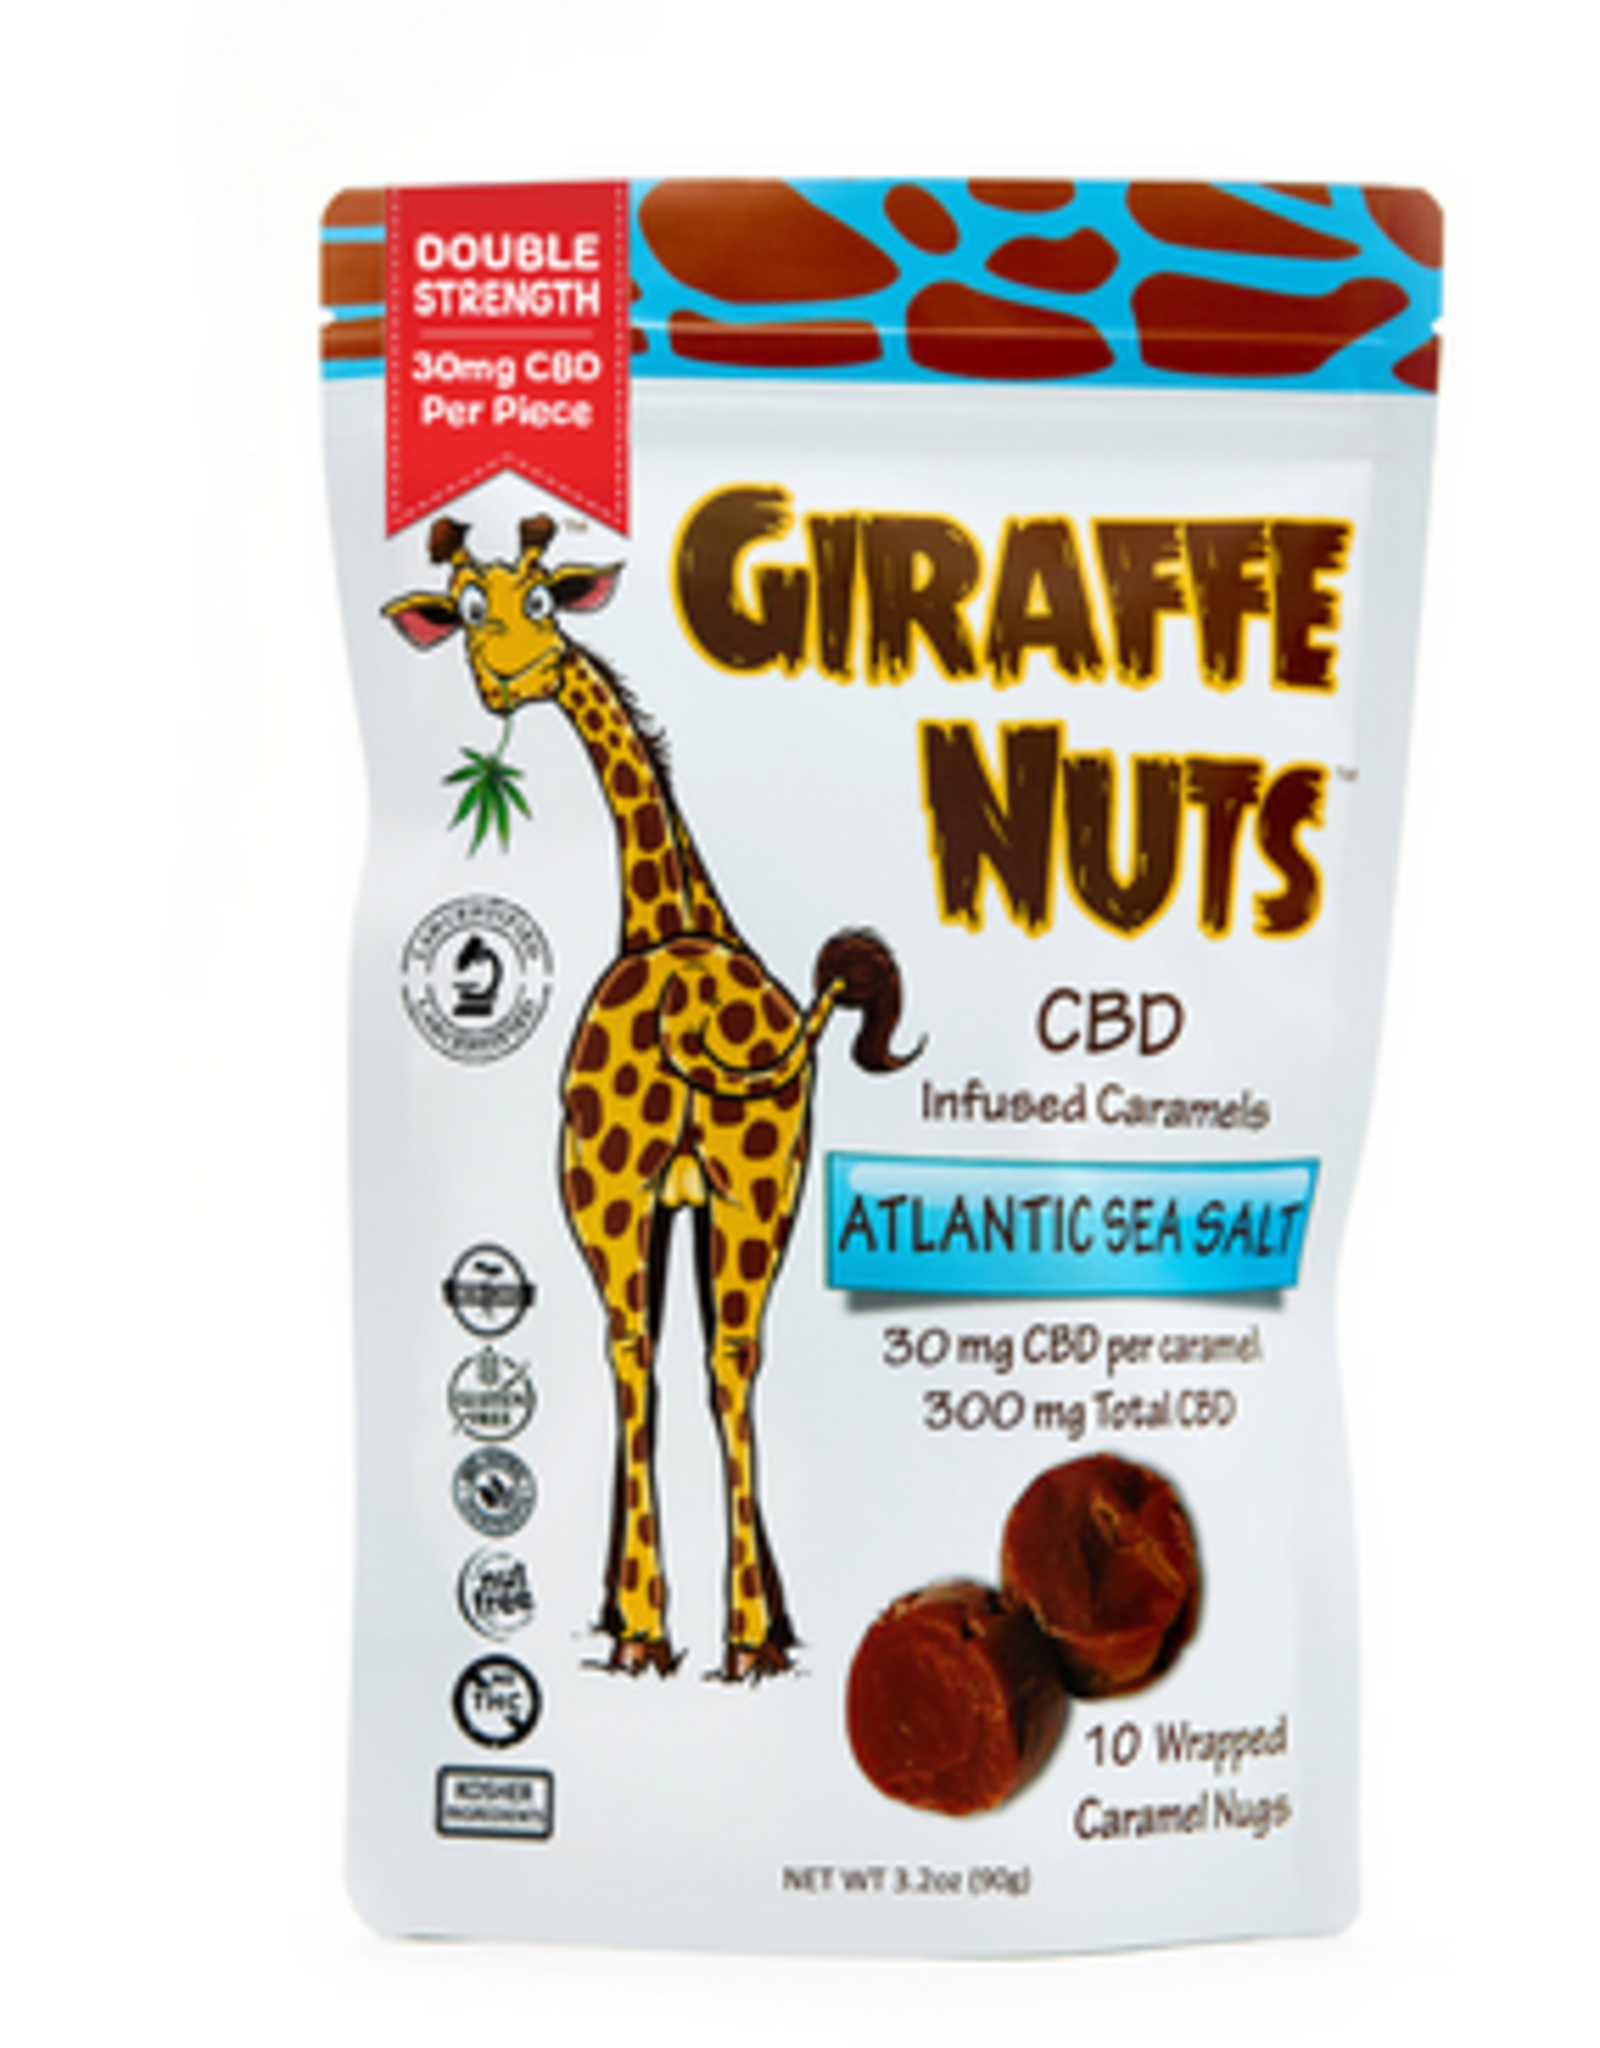 Lions Brand CBD CBD Giraffe Nuts Atlantic Sea Salt 300mg